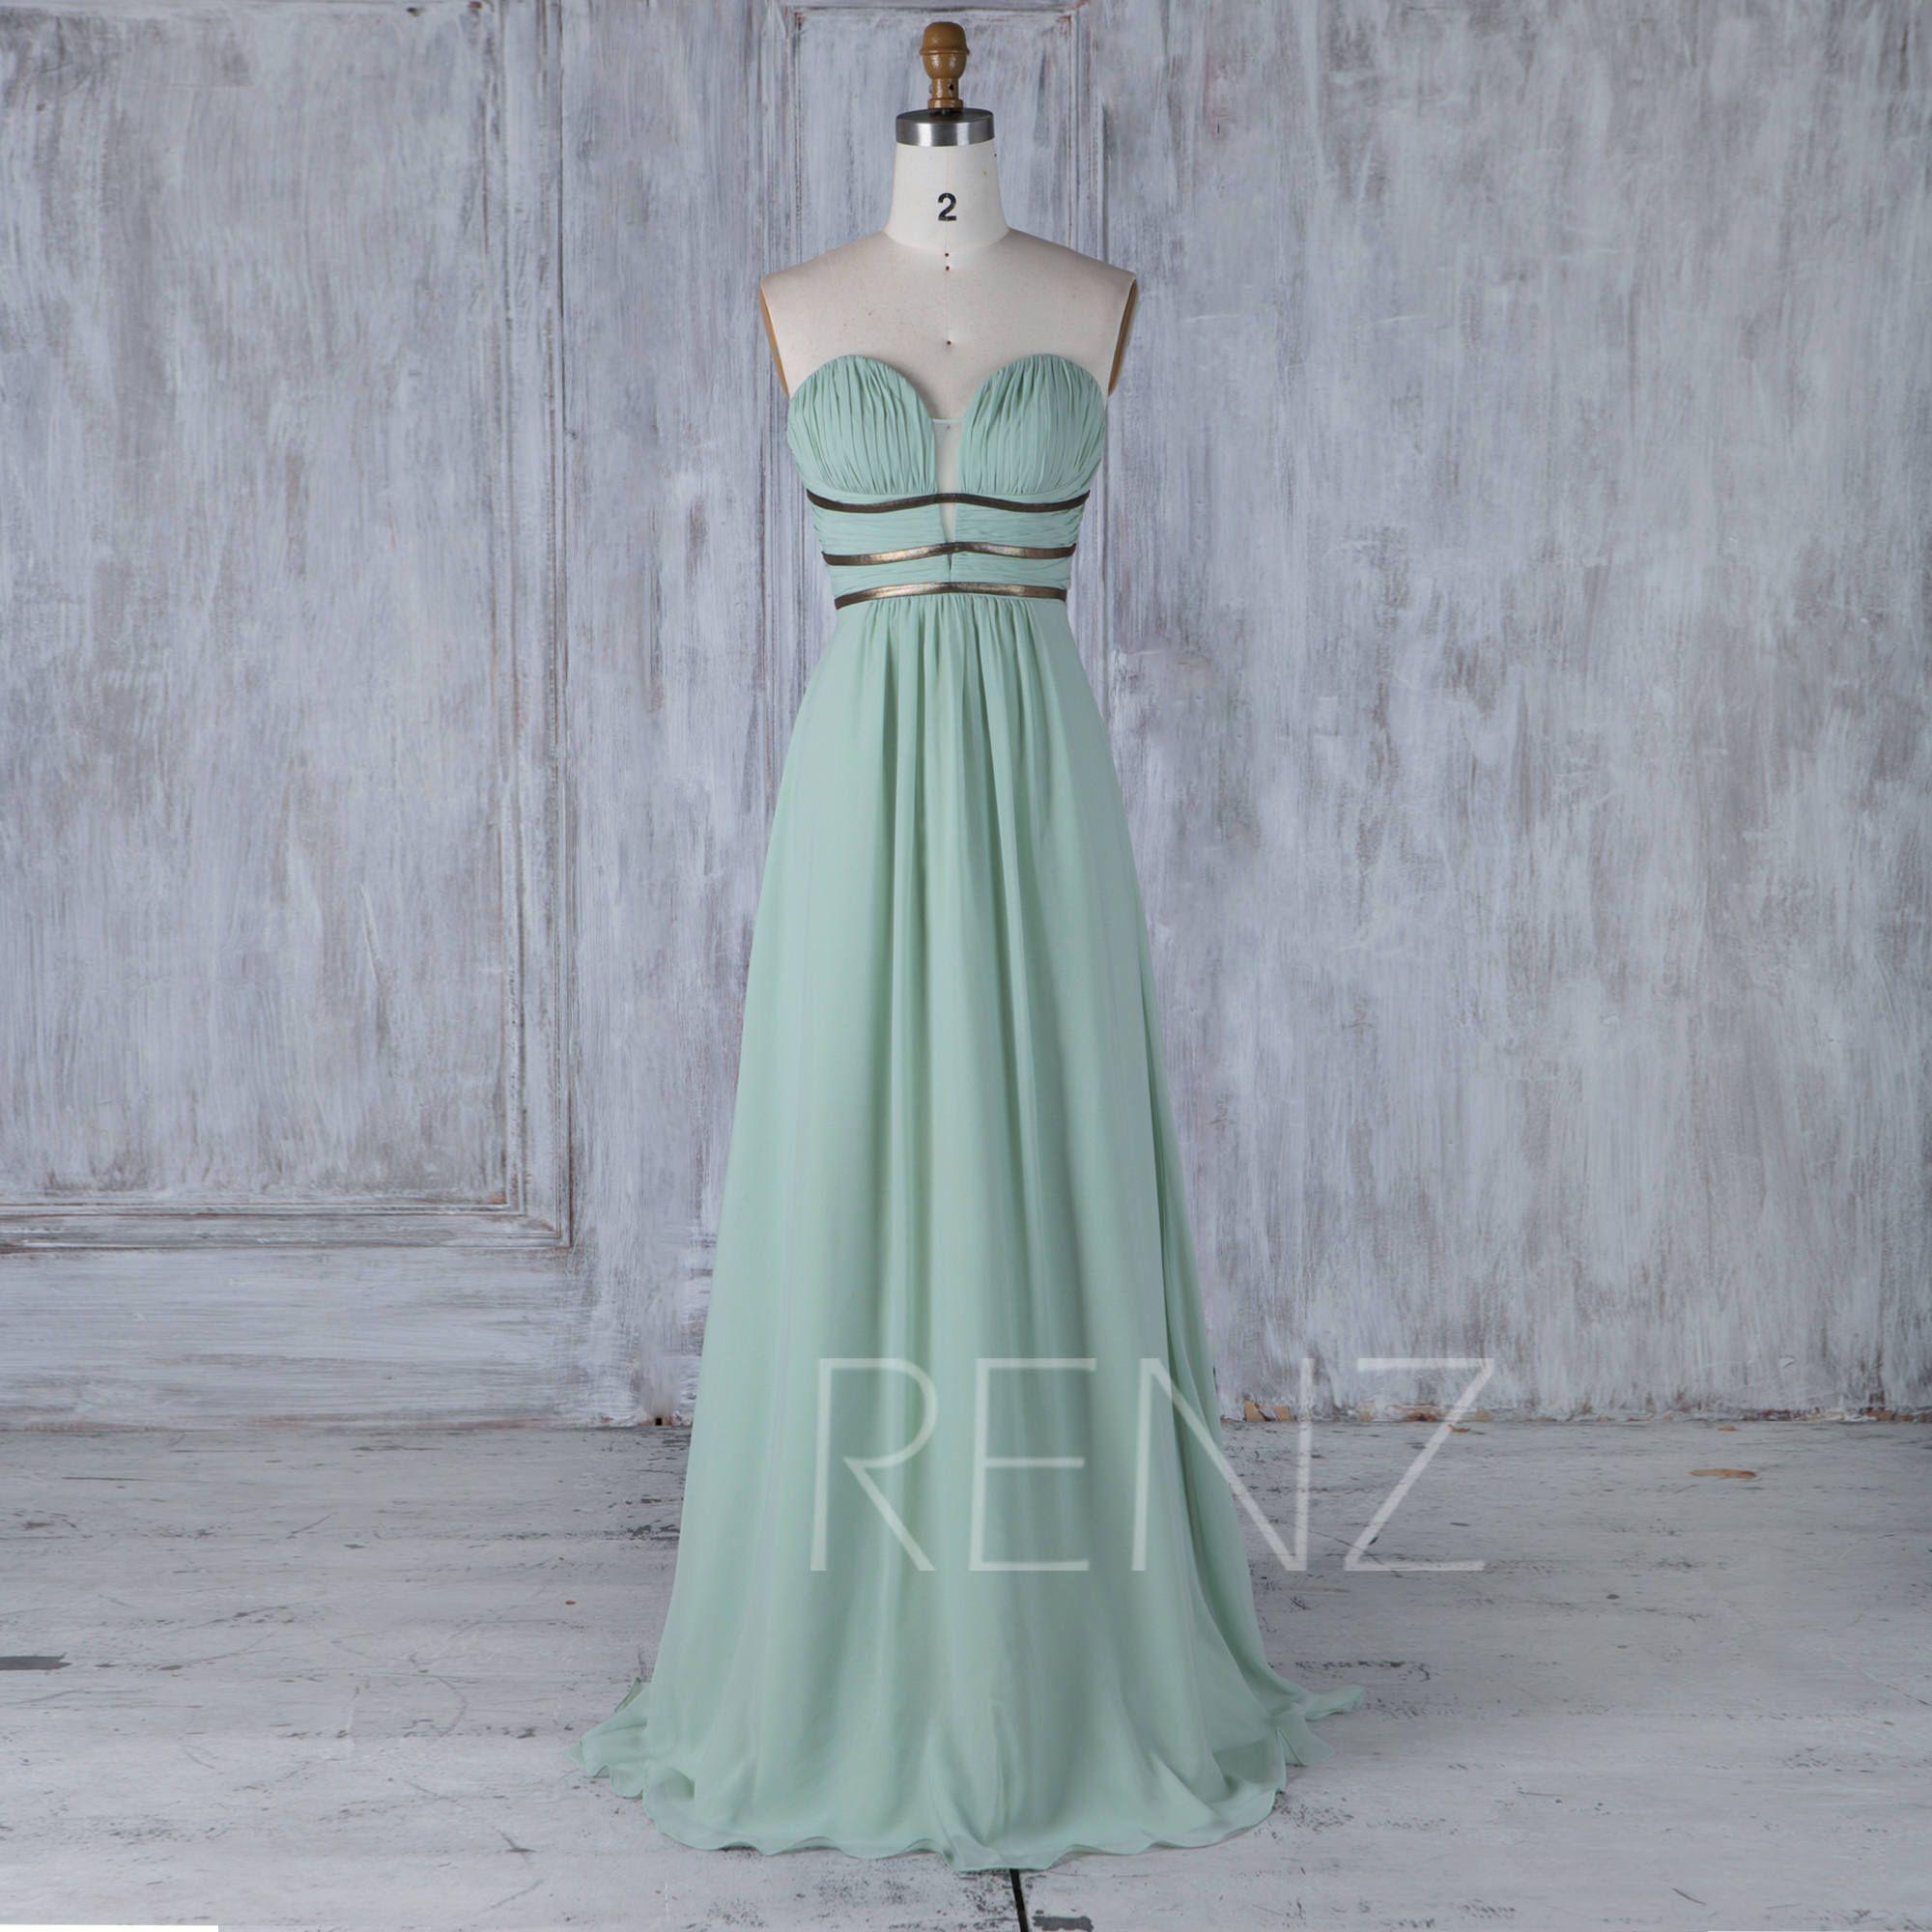 Gold belt for wedding dress  Dusty Mint Chiffon Bridesmaid Dress Ruched Sweetheart Wedding Dress